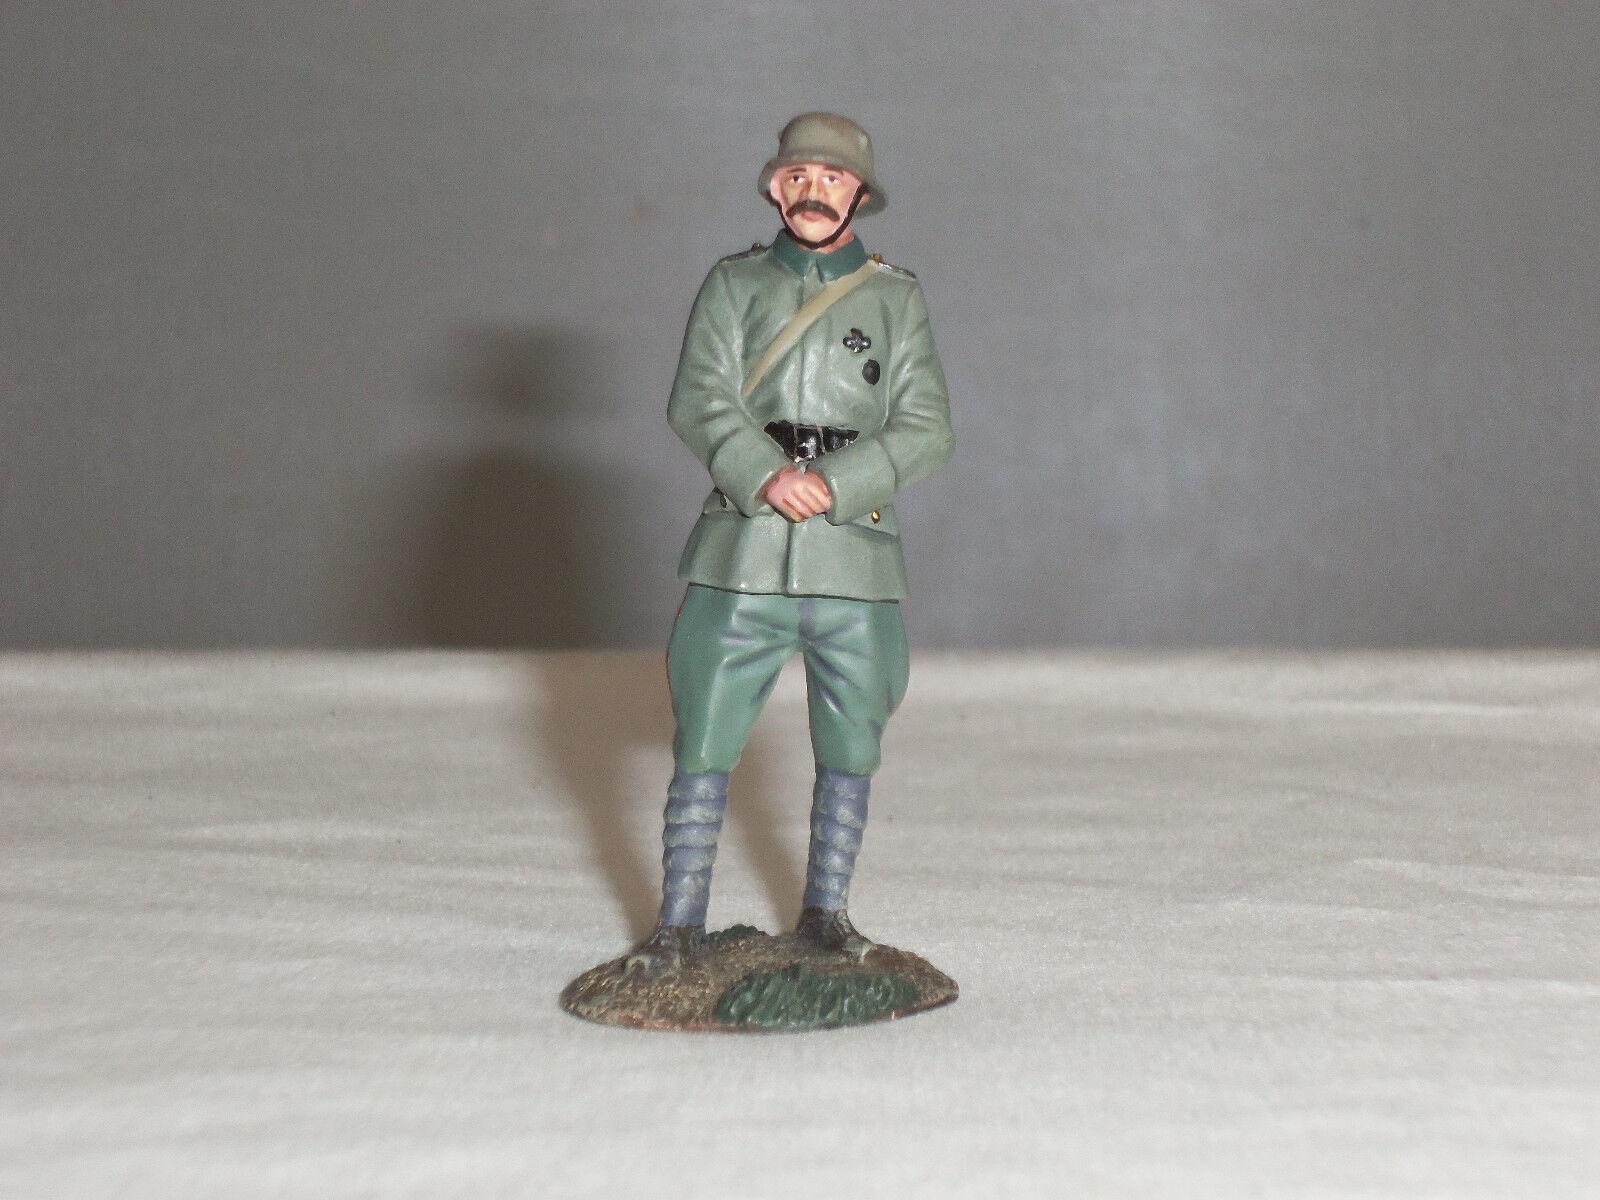 BRITAINS 23087 WW1 GERMAN INFANTRY OFFICER STANDING METAL TOY SOLDIER FIGURE